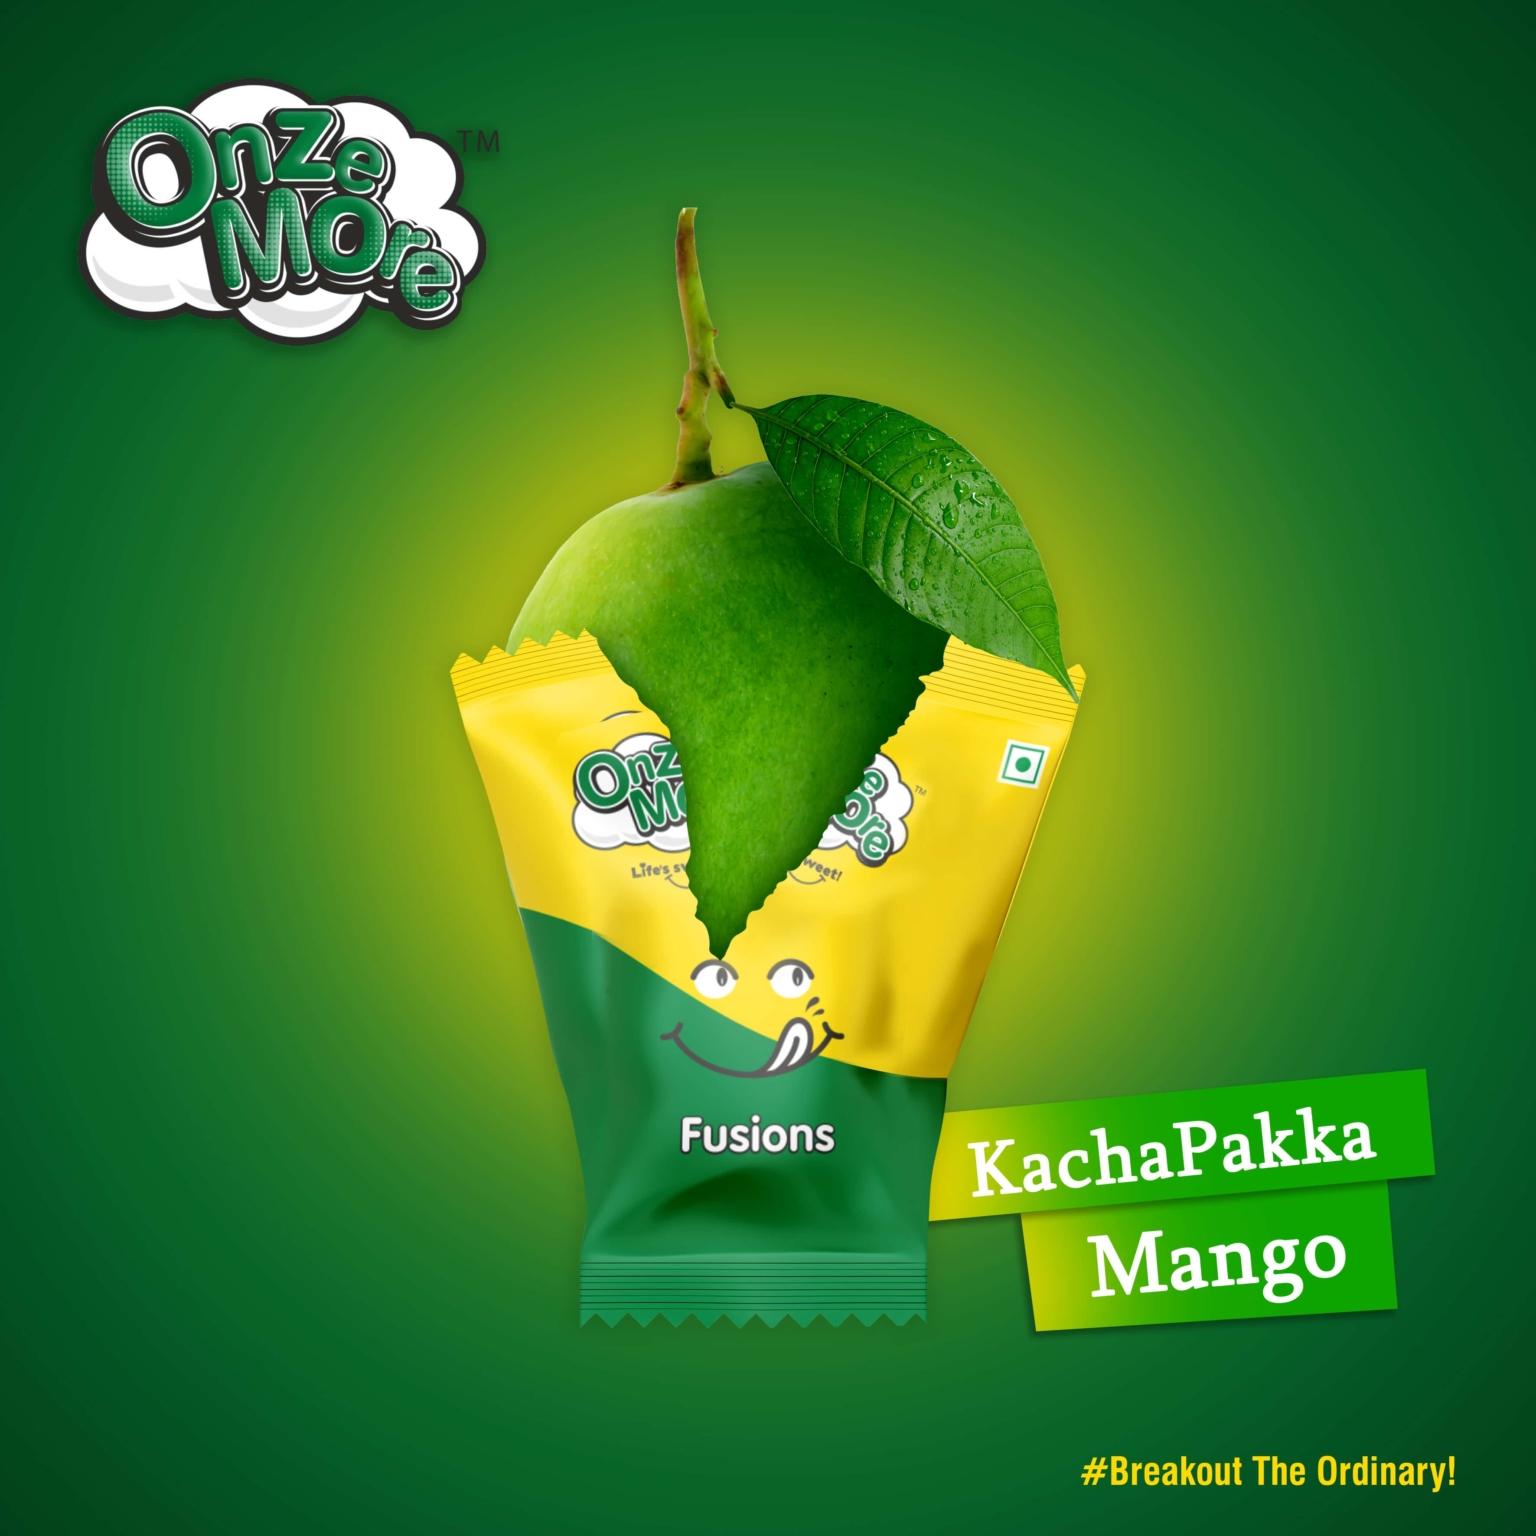 Kachhapackka Mango - season greetings - 1500